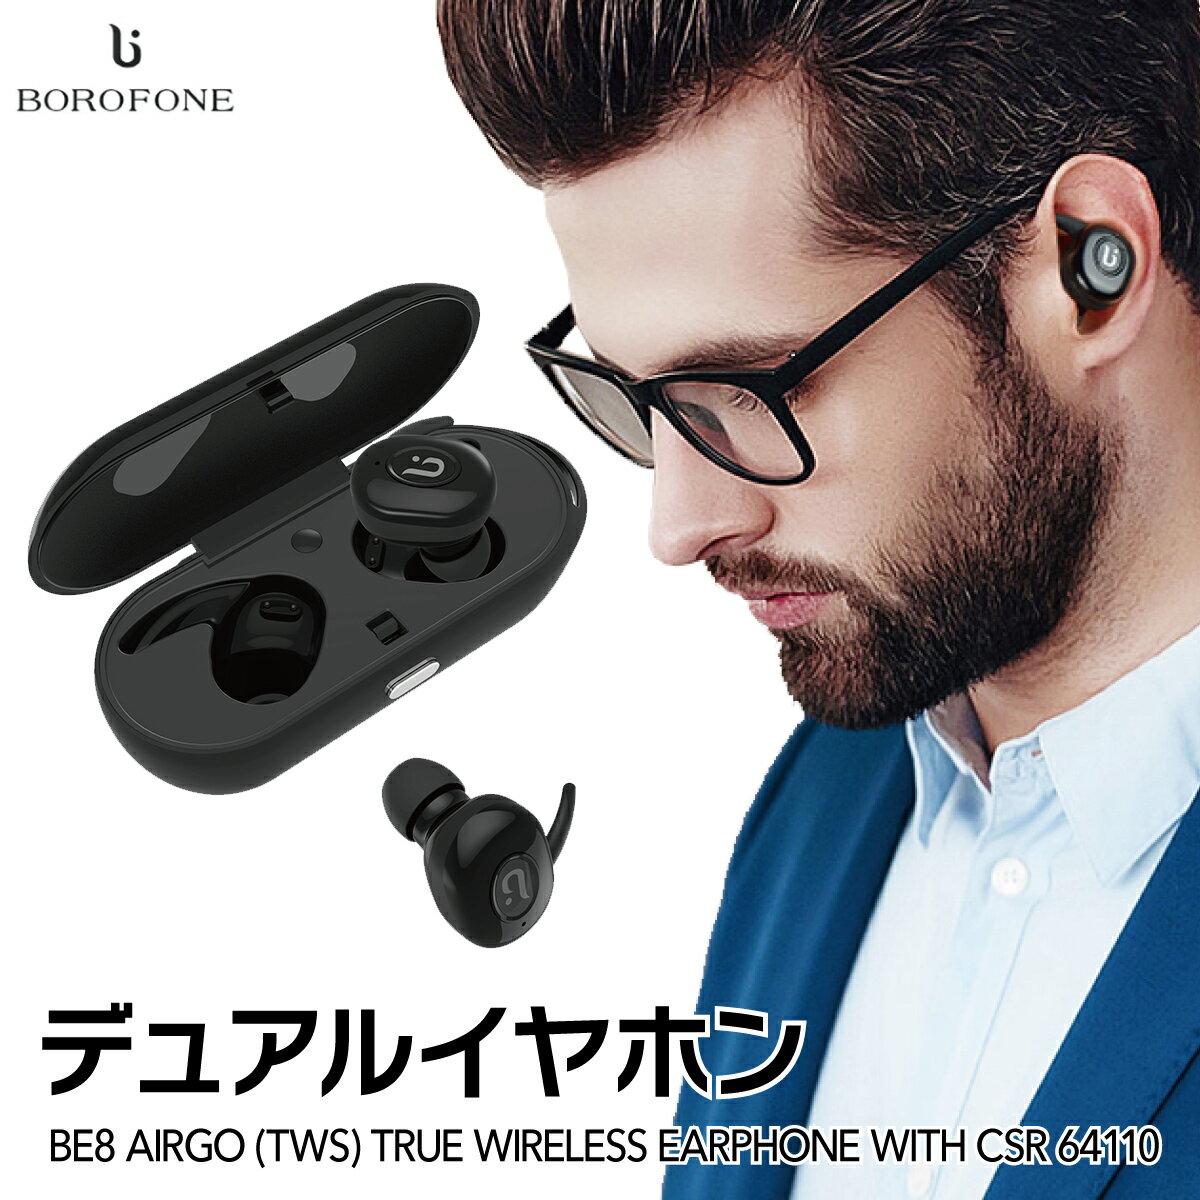 Bluetooth ワイヤレスイヤホン 両耳 スポーツイヤホン ヘッドセット イヤホンマイク ハンズフリーヘッドセットワイヤレス イヤホン ランニング Bluetooth 送料無料 ボロフォン BOROFONE borofone-be8